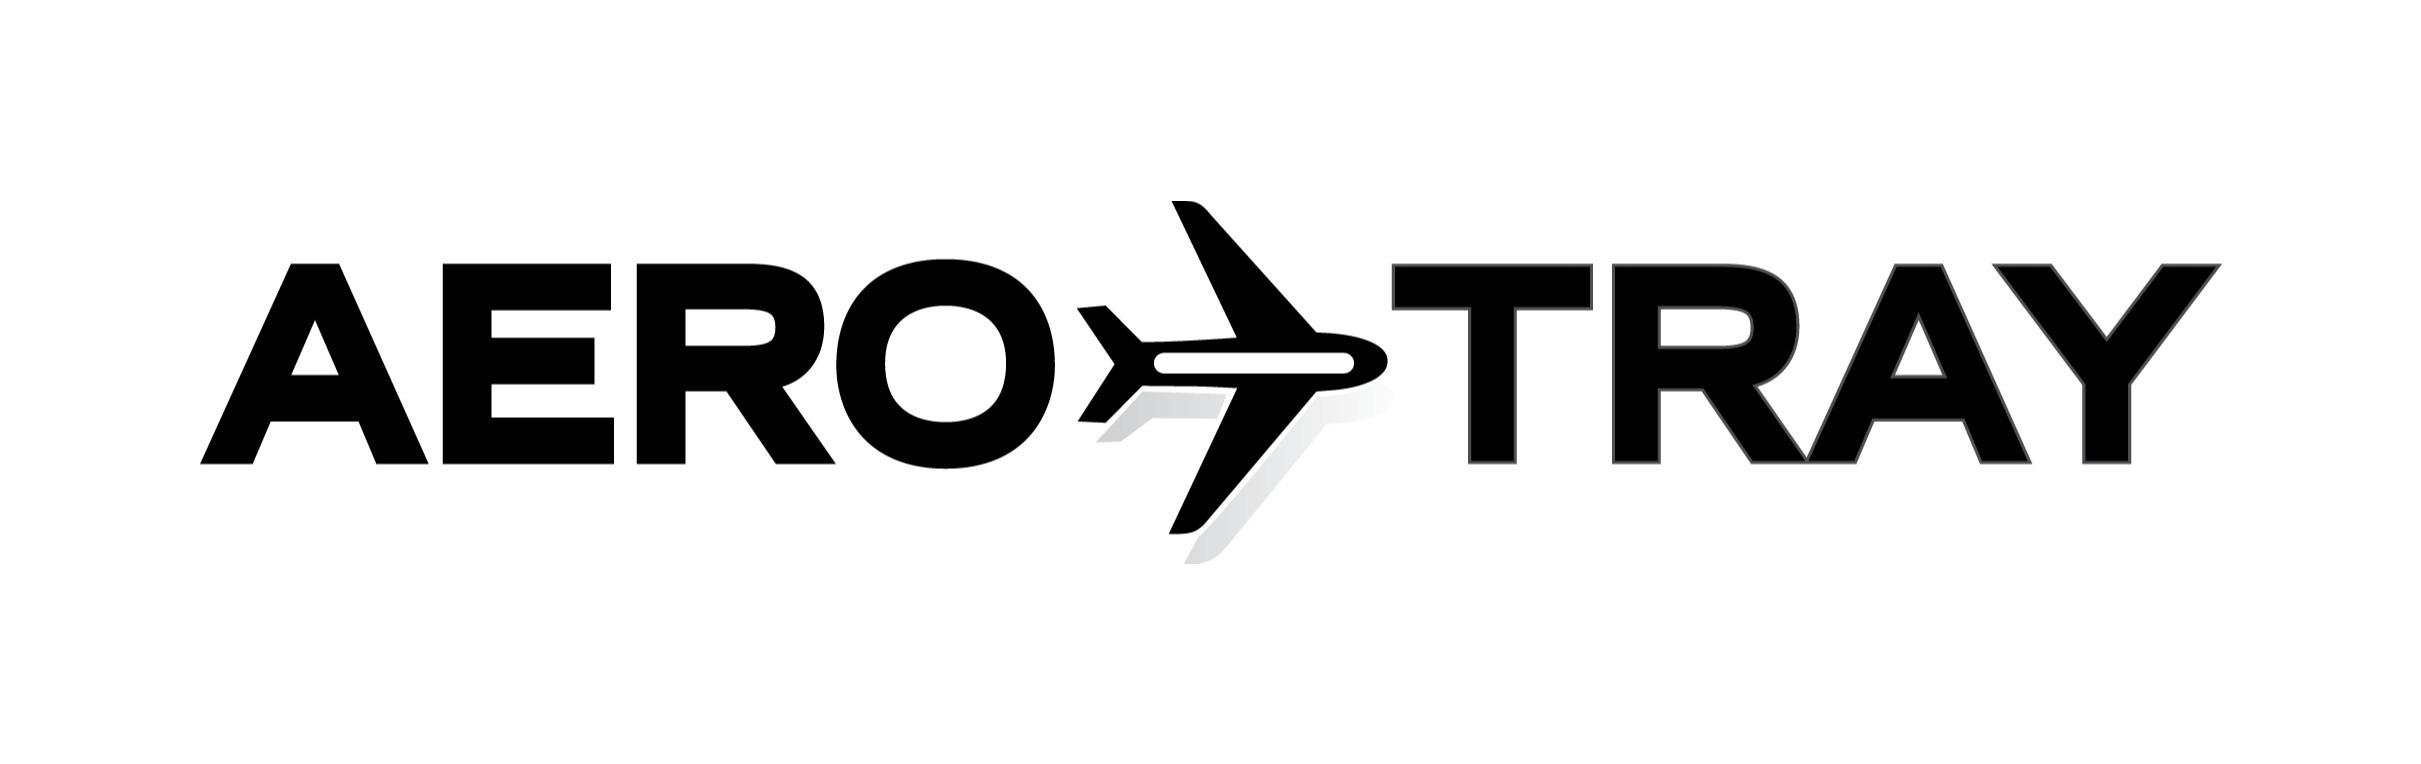 Aero-Tray Coupons & Promo codes